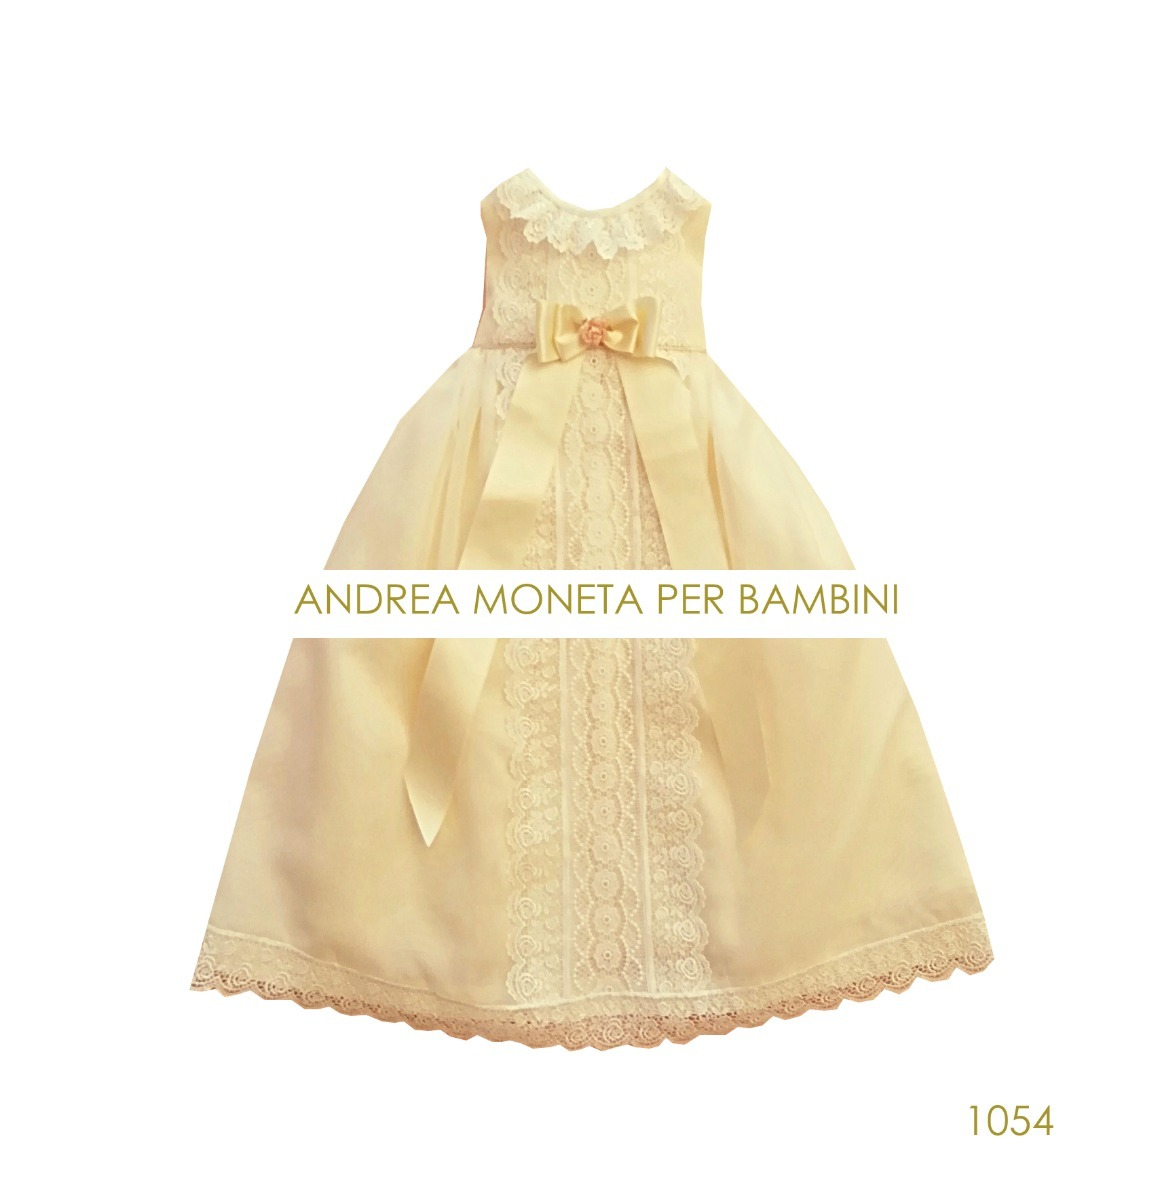 344863559 espectacular vestido bautismo crema bebe andrea moneta 1054. Cargando zoom.